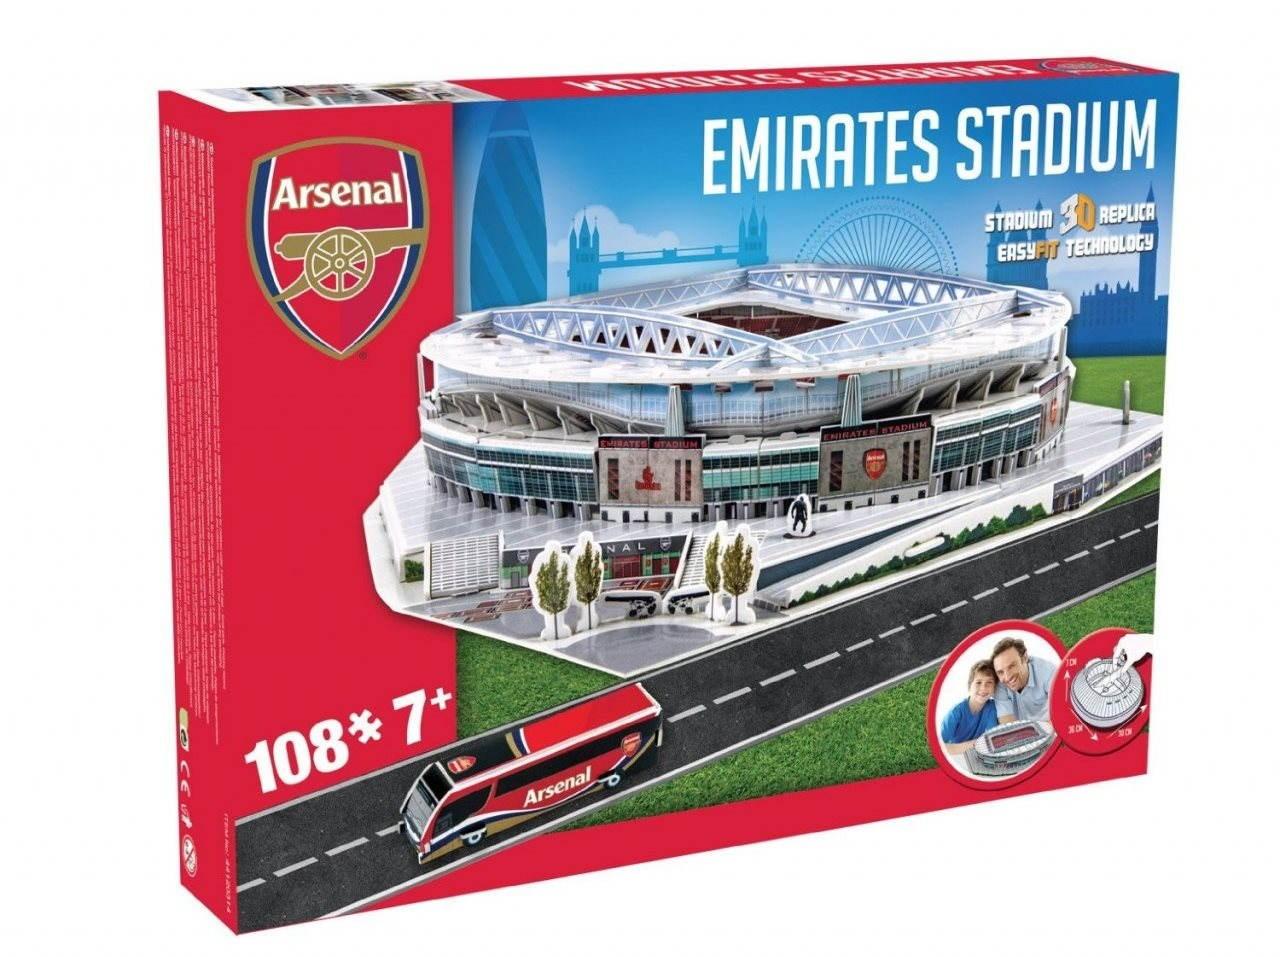 3d puzzle nanostad uk emirates fotbalov stadion arsenal puzzle. Black Bedroom Furniture Sets. Home Design Ideas